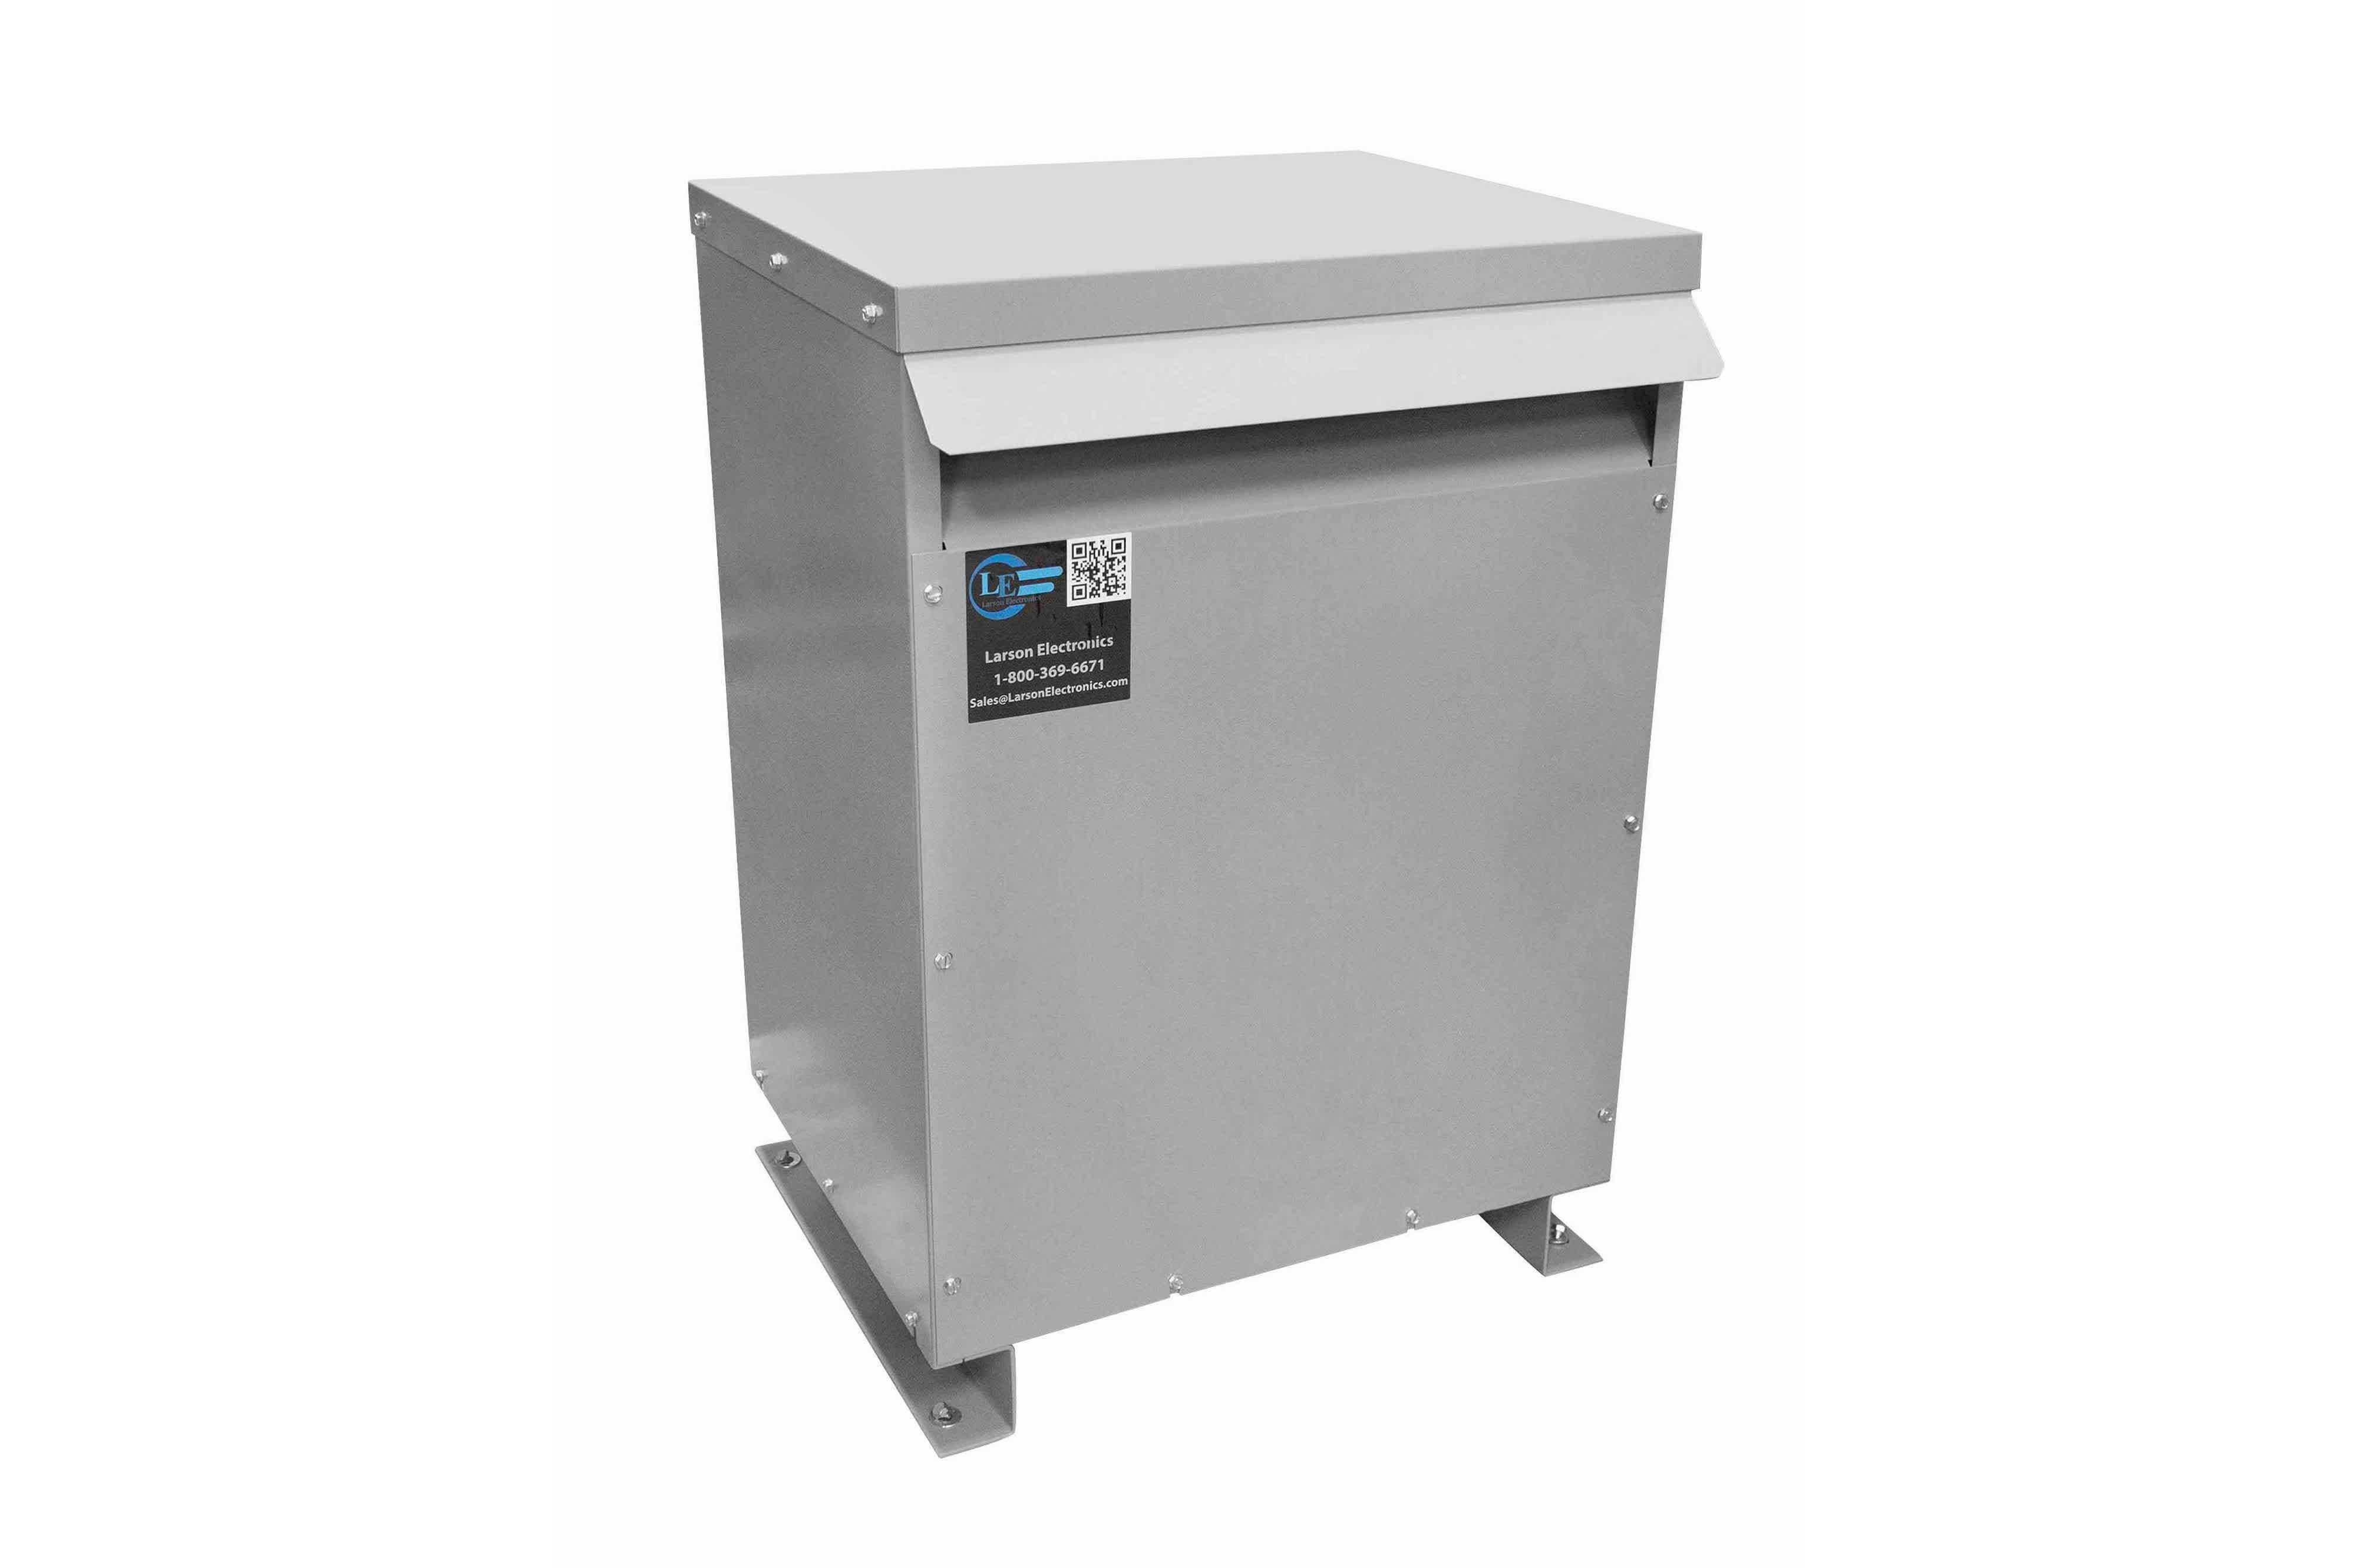 300 kVA 3PH Isolation Transformer, 600V Wye Primary, 480V Delta Secondary, N3R, Ventilated, 60 Hz